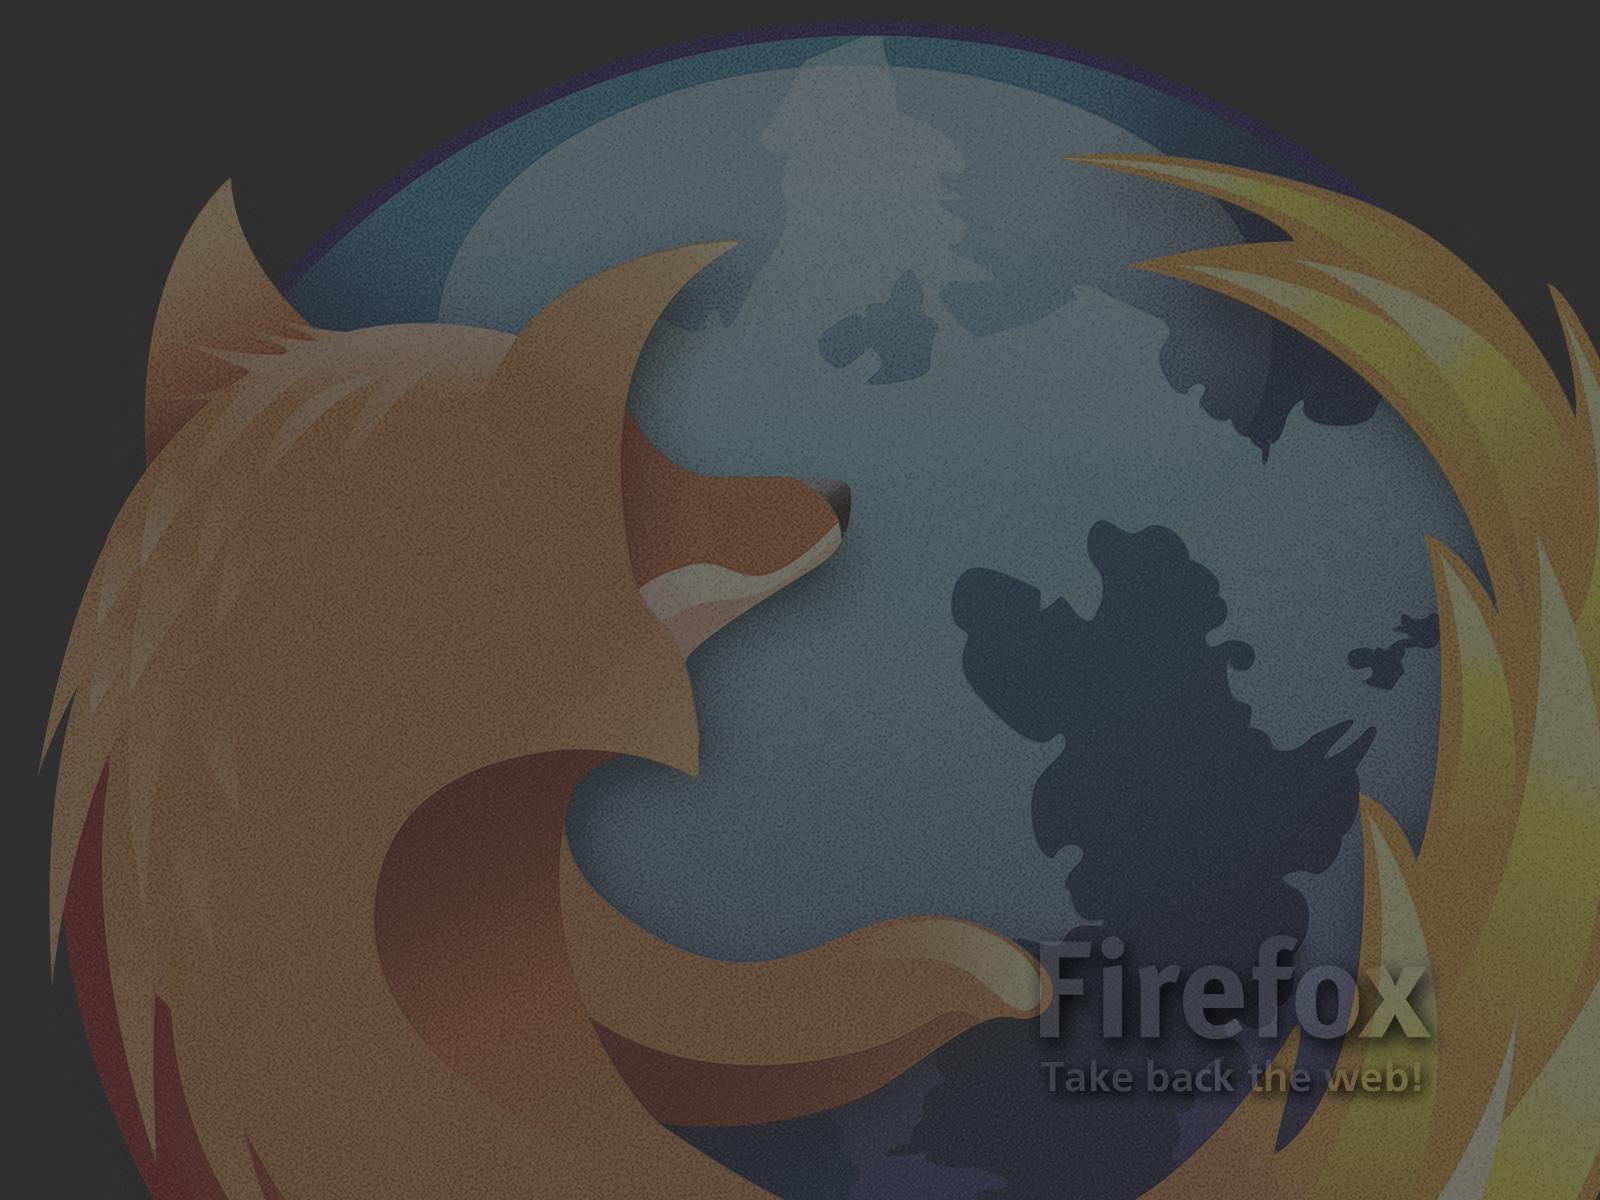 http://2.bp.blogspot.com/-3xkWdG0rM2c/TgmyyvAgSmI/AAAAAAAAA6w/C12Ij1eT6qY/s1600/firefox1%2Bby%2Bwww.bdtvstar.com%2B%252810%2529.jpg